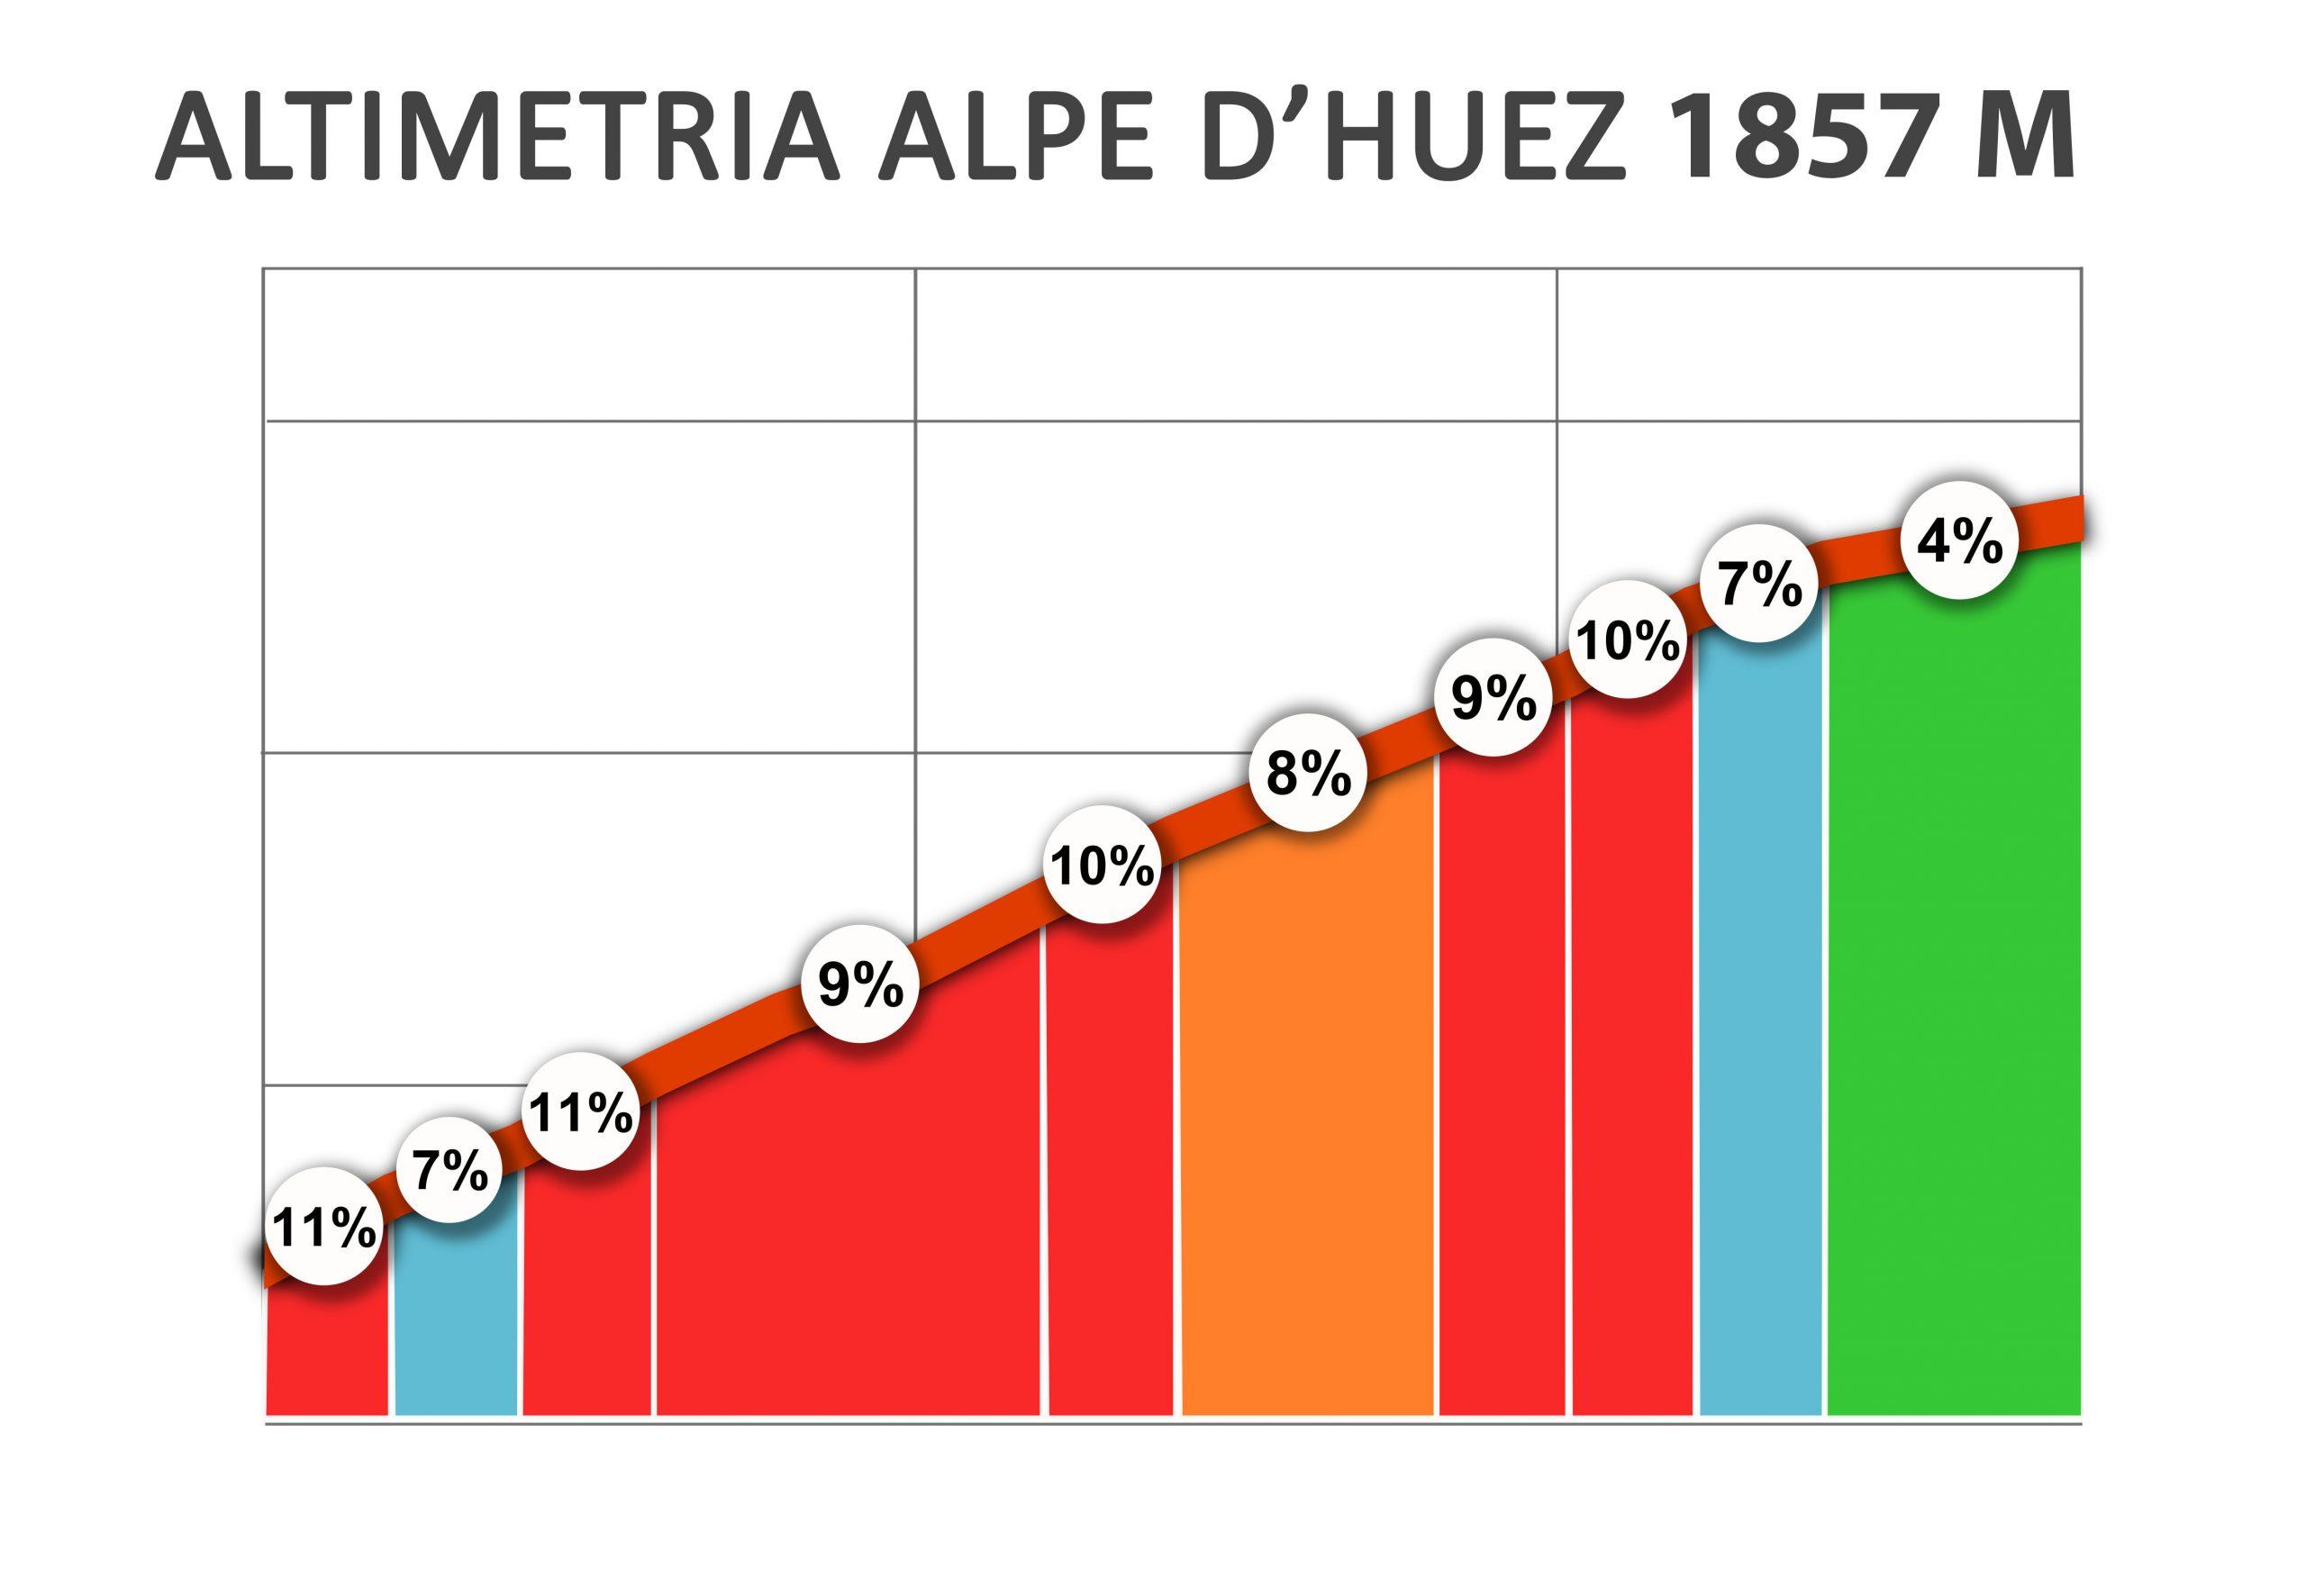 Altimetria Alpe d'Huez